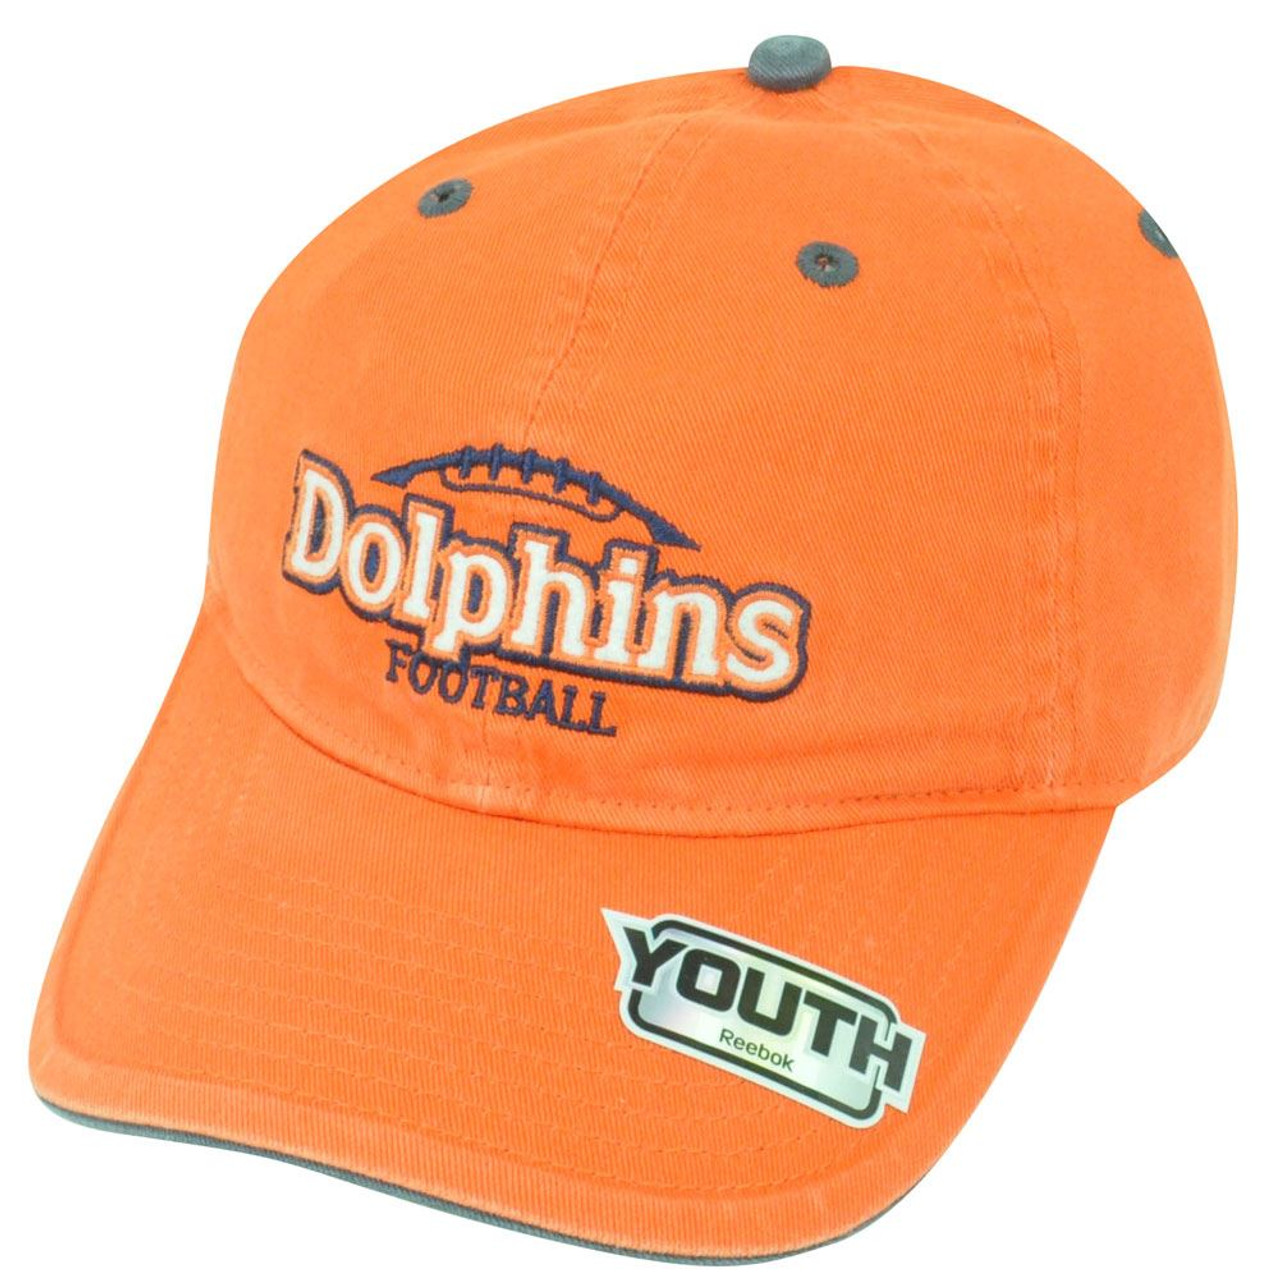 NFL Miami Dolphins Reebok Youth Adjustable Clip Buckle Orange Cap Hat  DH1447 - Sinbad Sports Store 3287b1b48